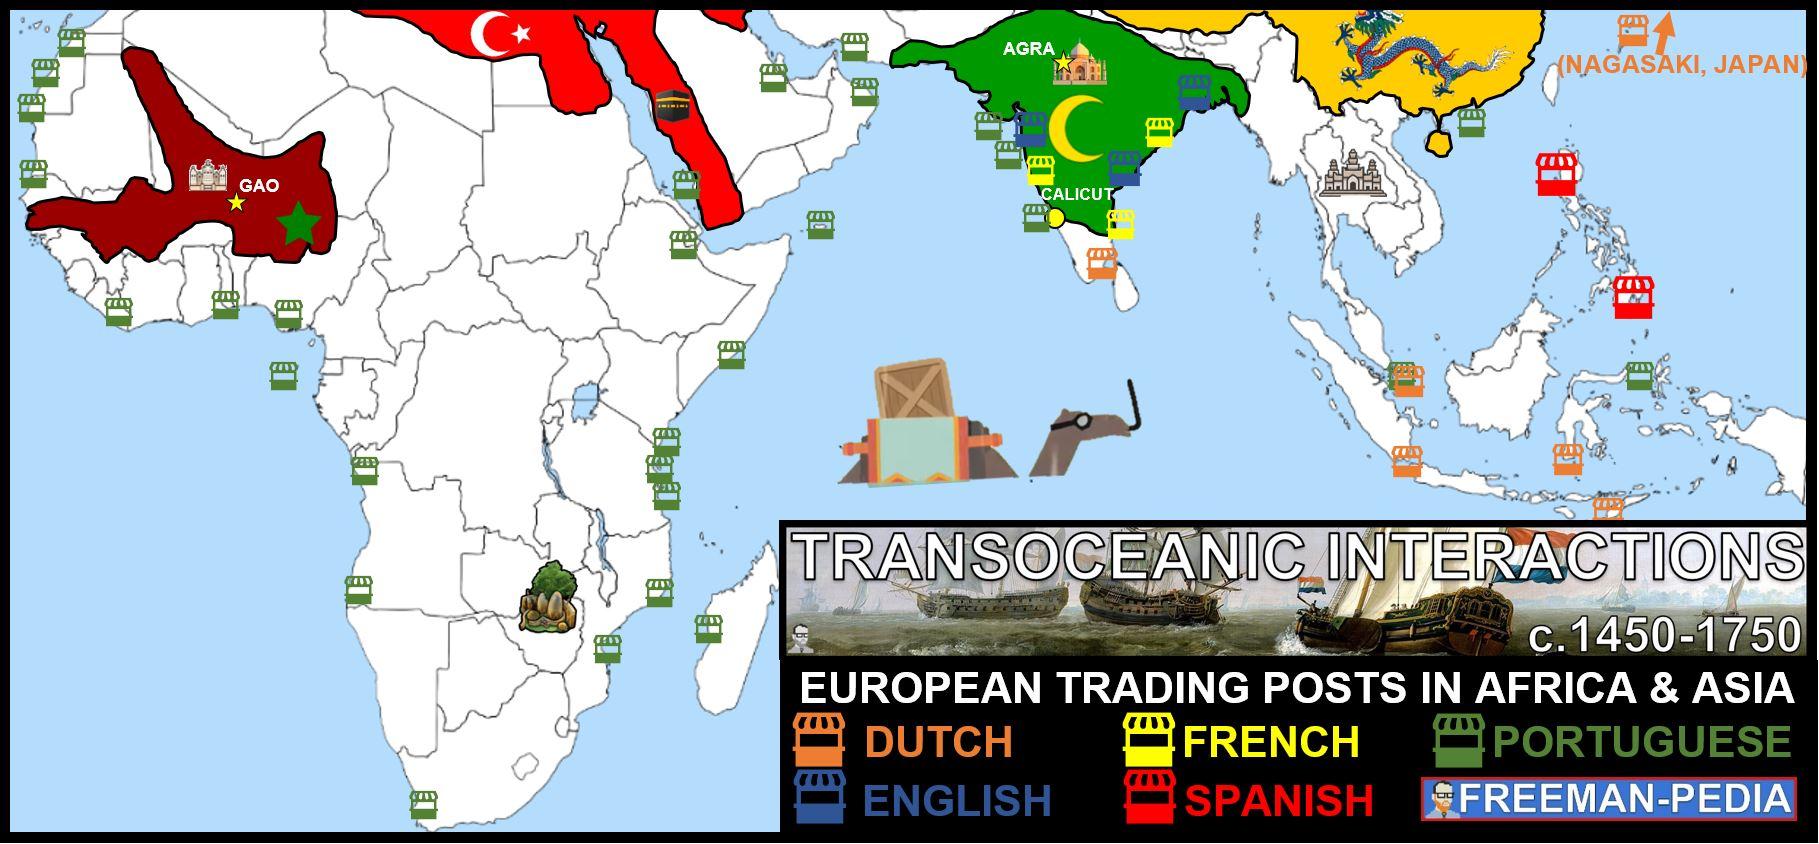 EUROPEAN TRADING POSTS AFRICA ASIA FREEMANPEDIA AP WORLD HISTORY.JPG